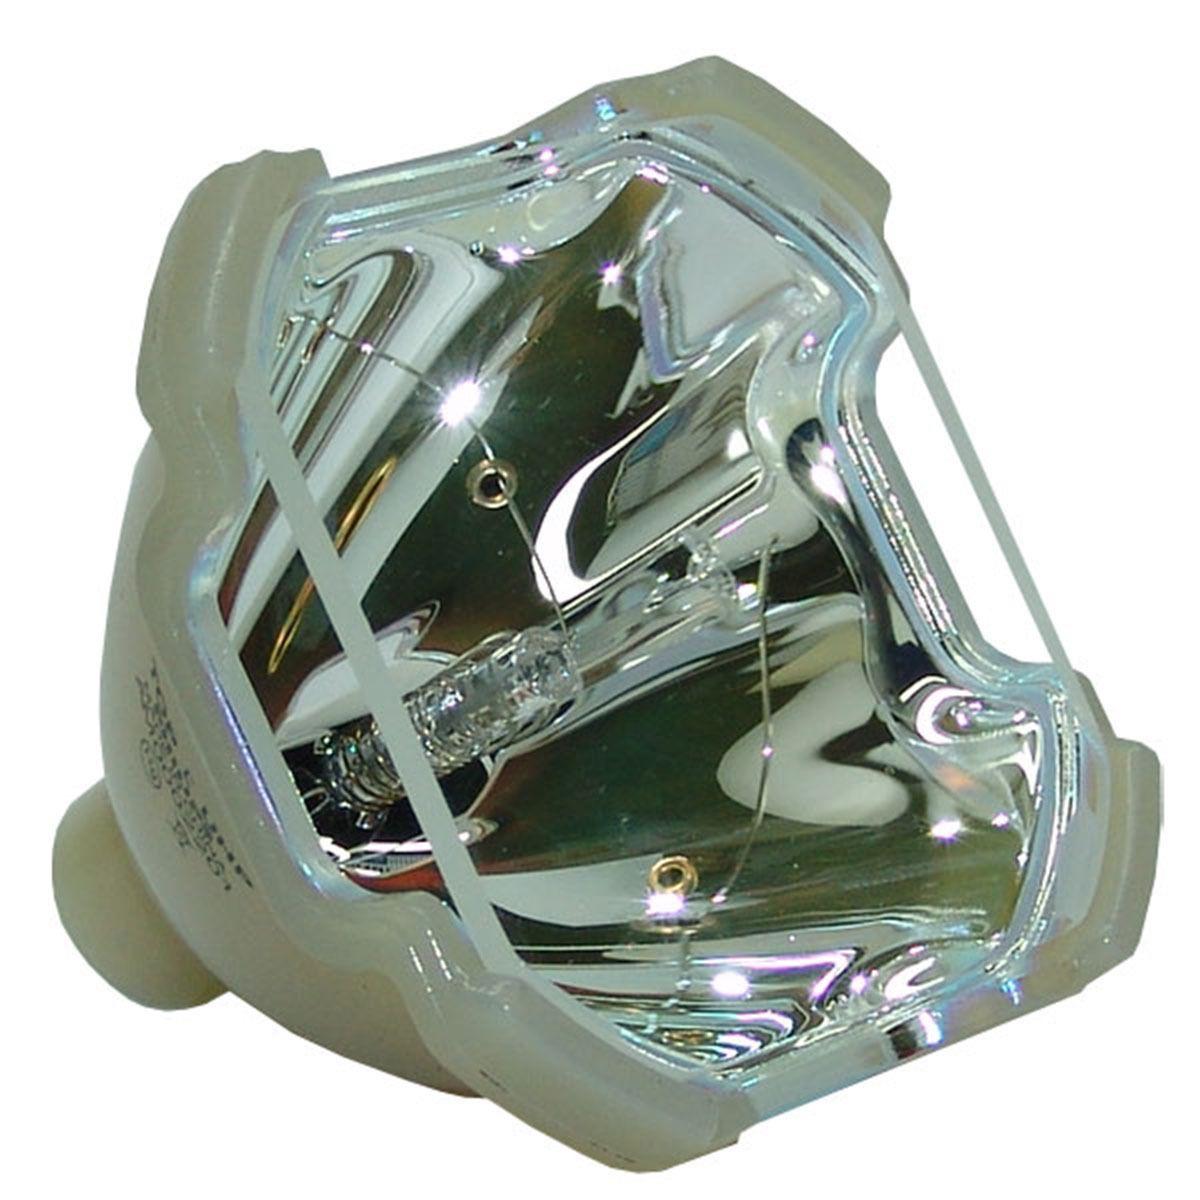 Compatible Bare Bulb POA-LMP48 LMP48 610-301-7167 for SANYO PLC-XT10 PLC-XT15 / Eiki LC-XG100 LC-XG200 Projector Bulb Lamp  free shipping 610 308 3117 poa lmp57 high quality compatible bare lamp for sanyo plc sw30 eiki lc sd10 lc sd12 projectors